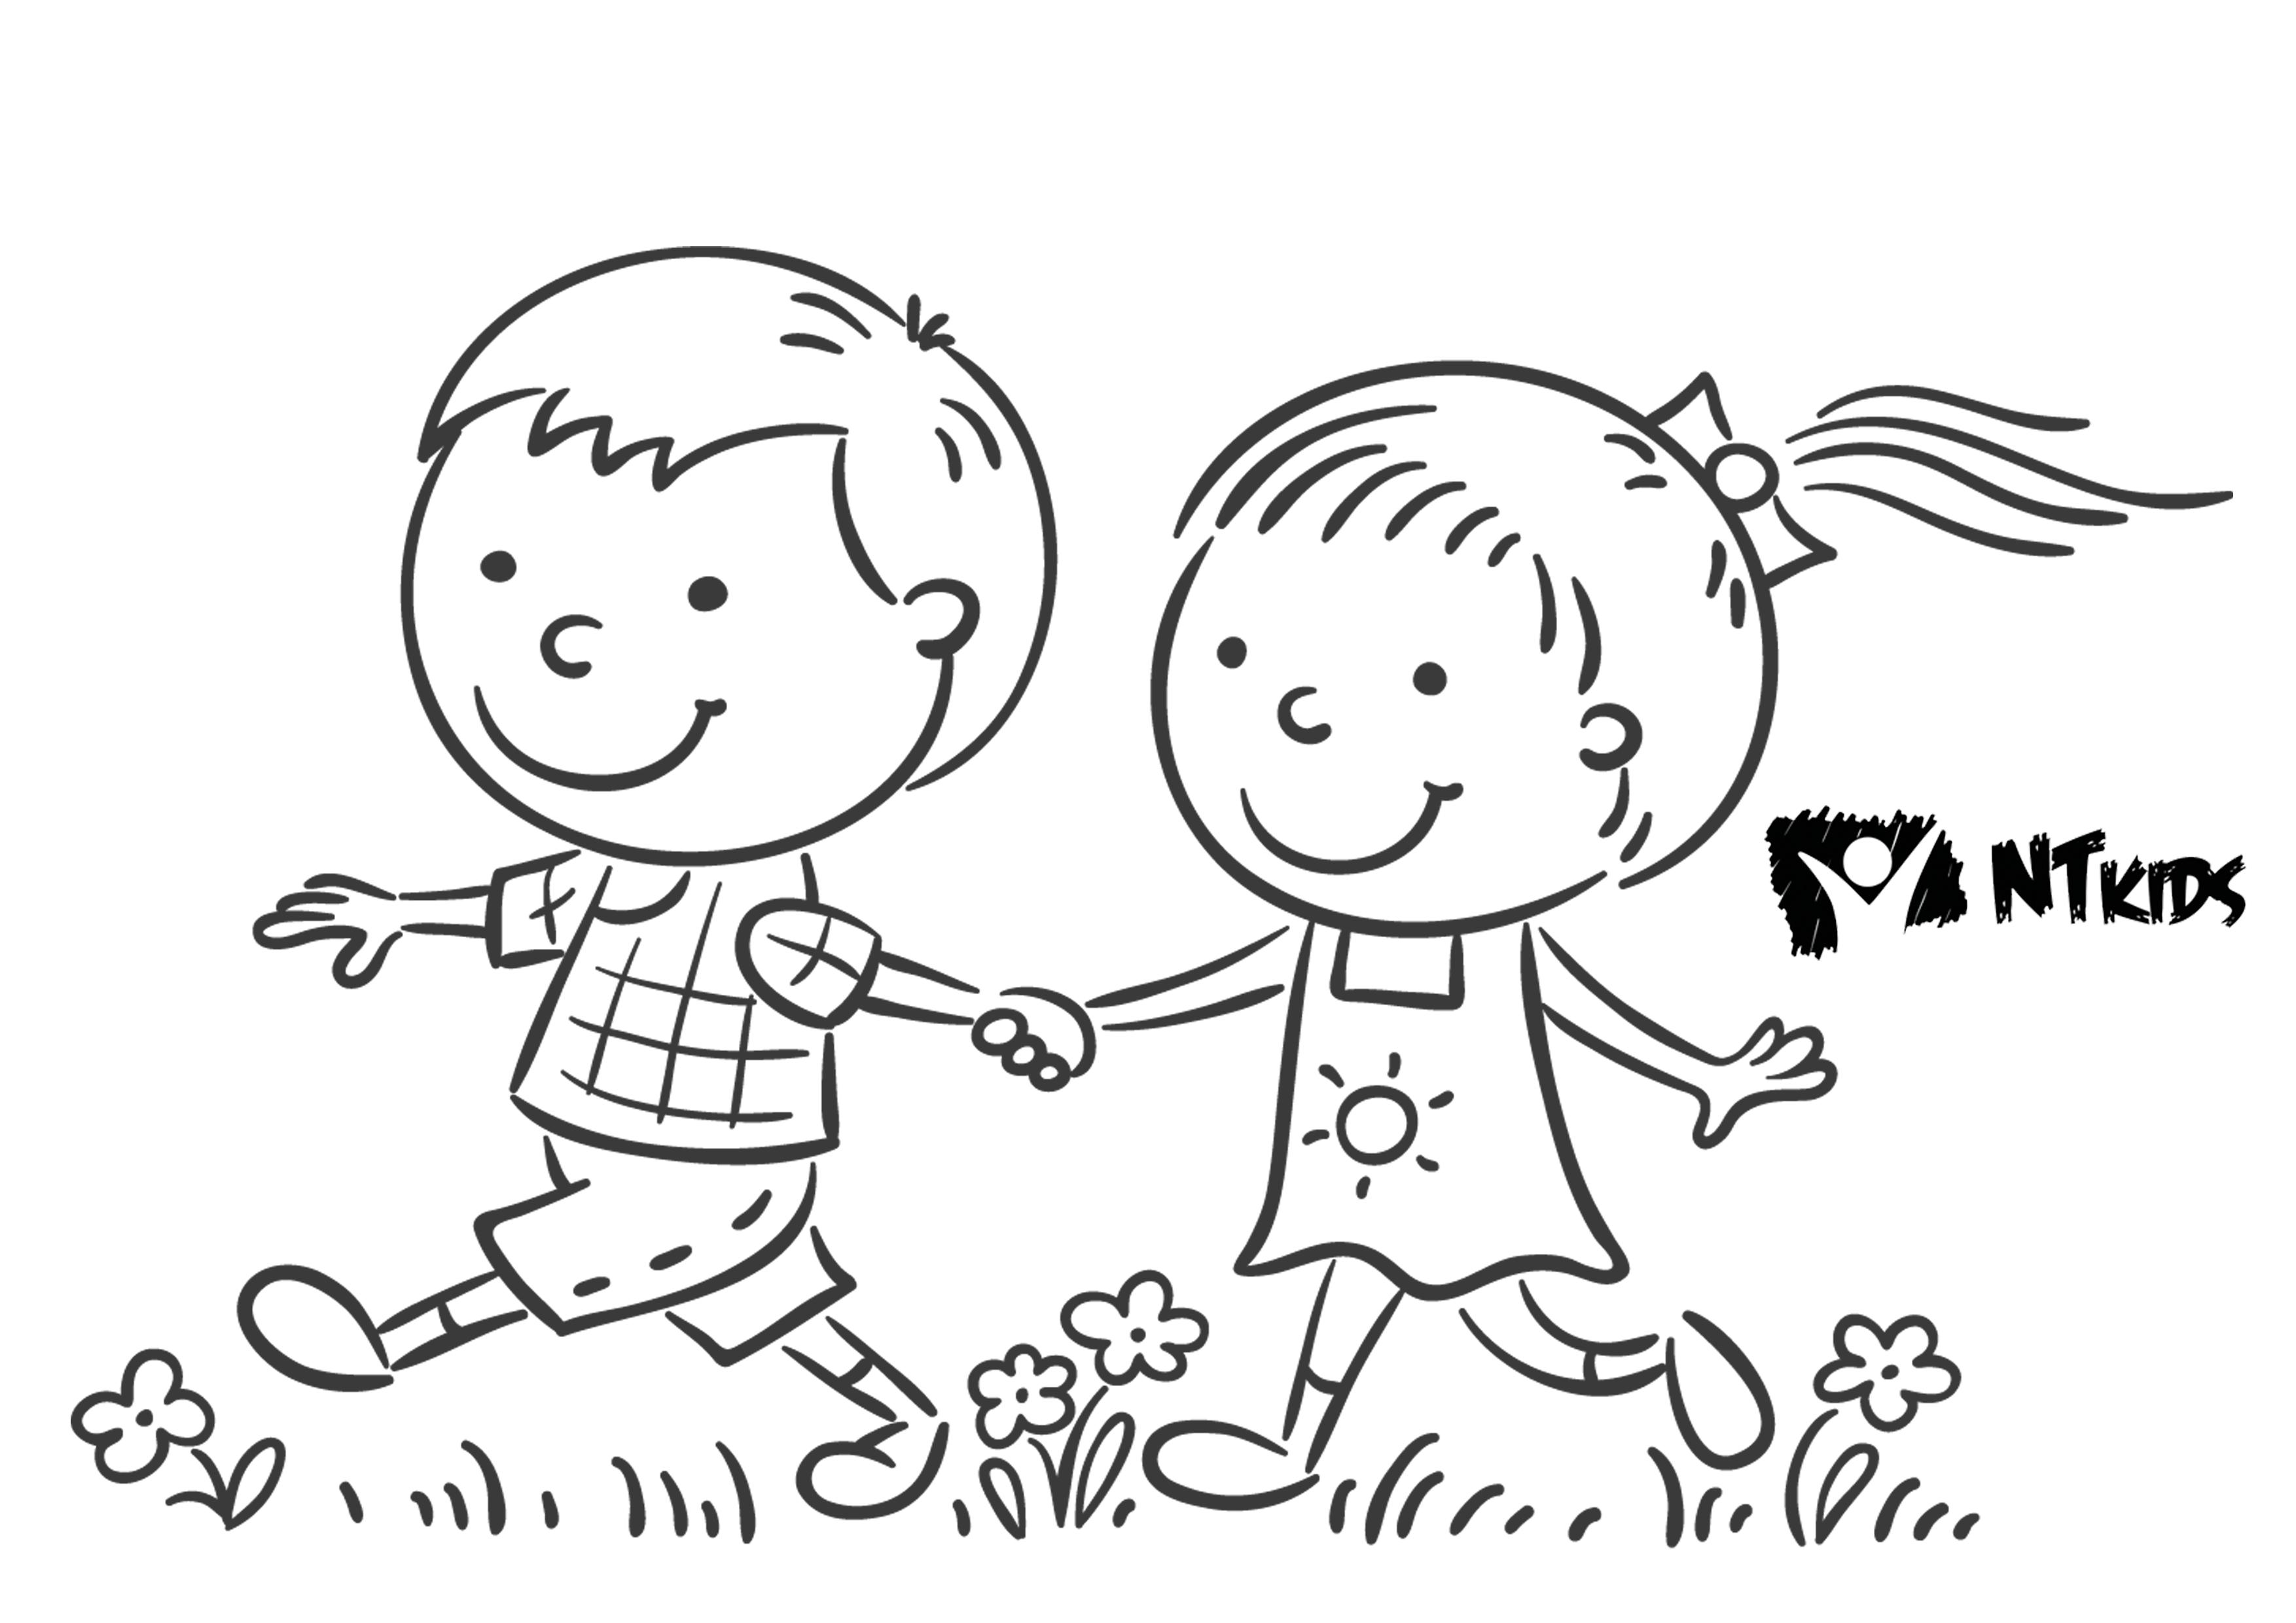 Colorir Criancas De Maos Dadas Png 3508 2480 Criancas De Maos